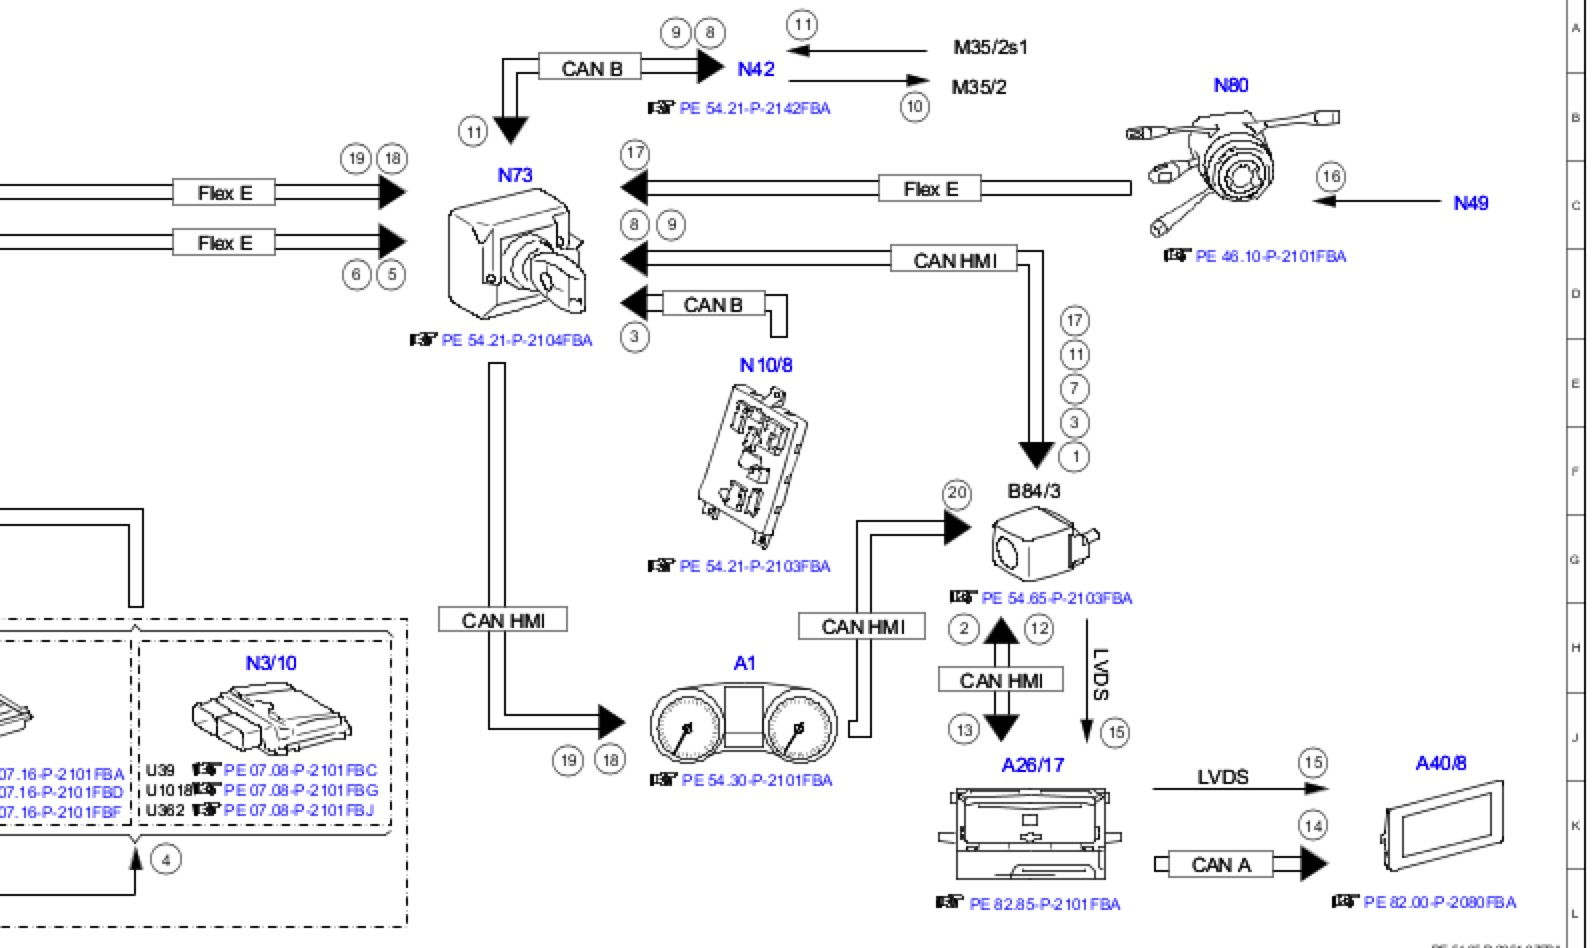 Arb Reversing Camera Wiring Diagram Just Another Blog Library Rh 4 Seo Memo De Compressor Manual